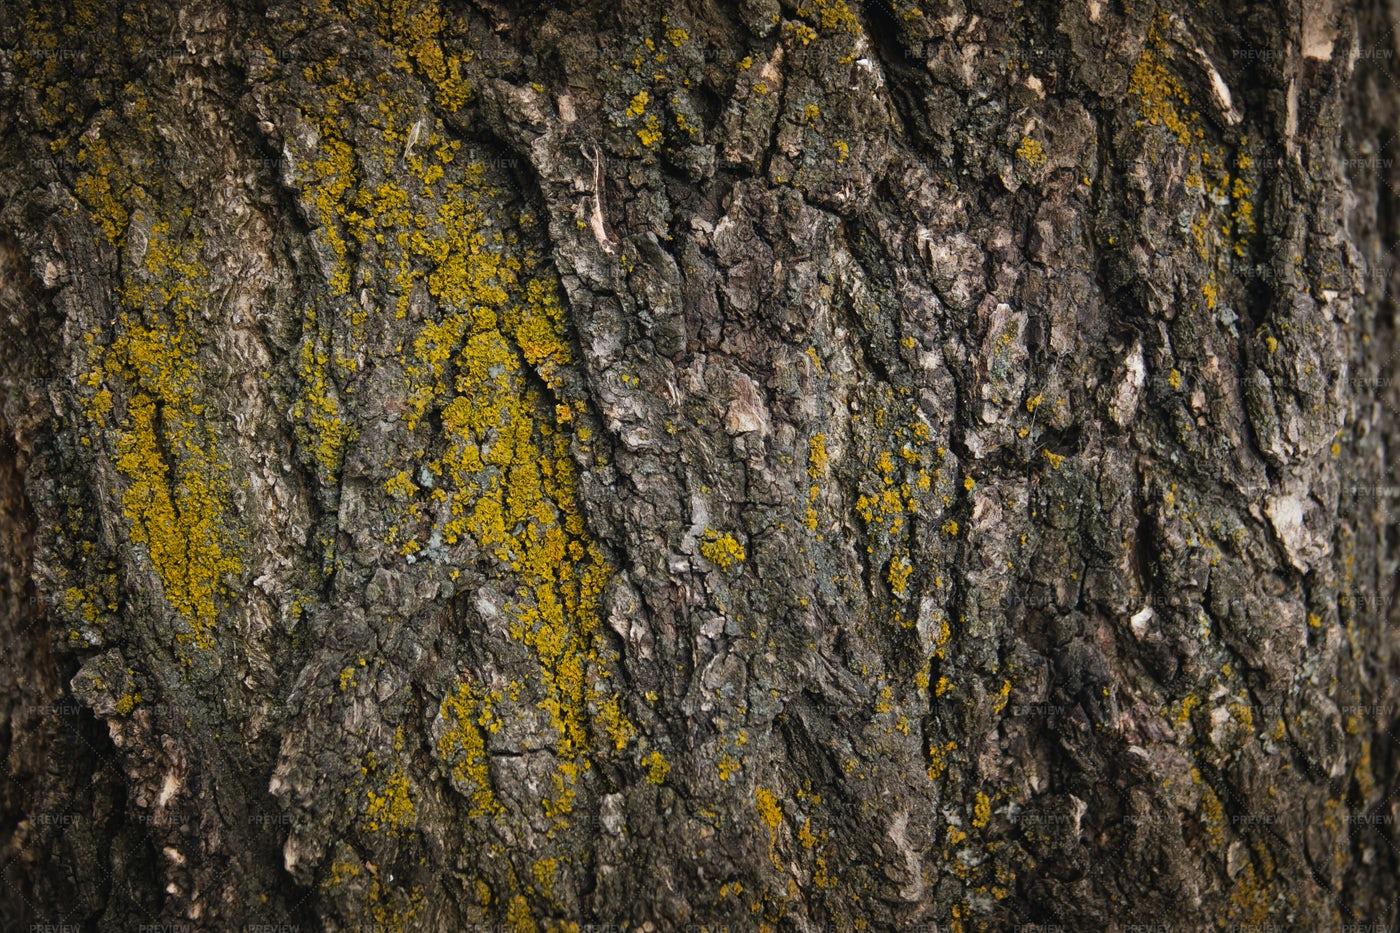 Texture Of Tree Bark With Moss: Stock Photos